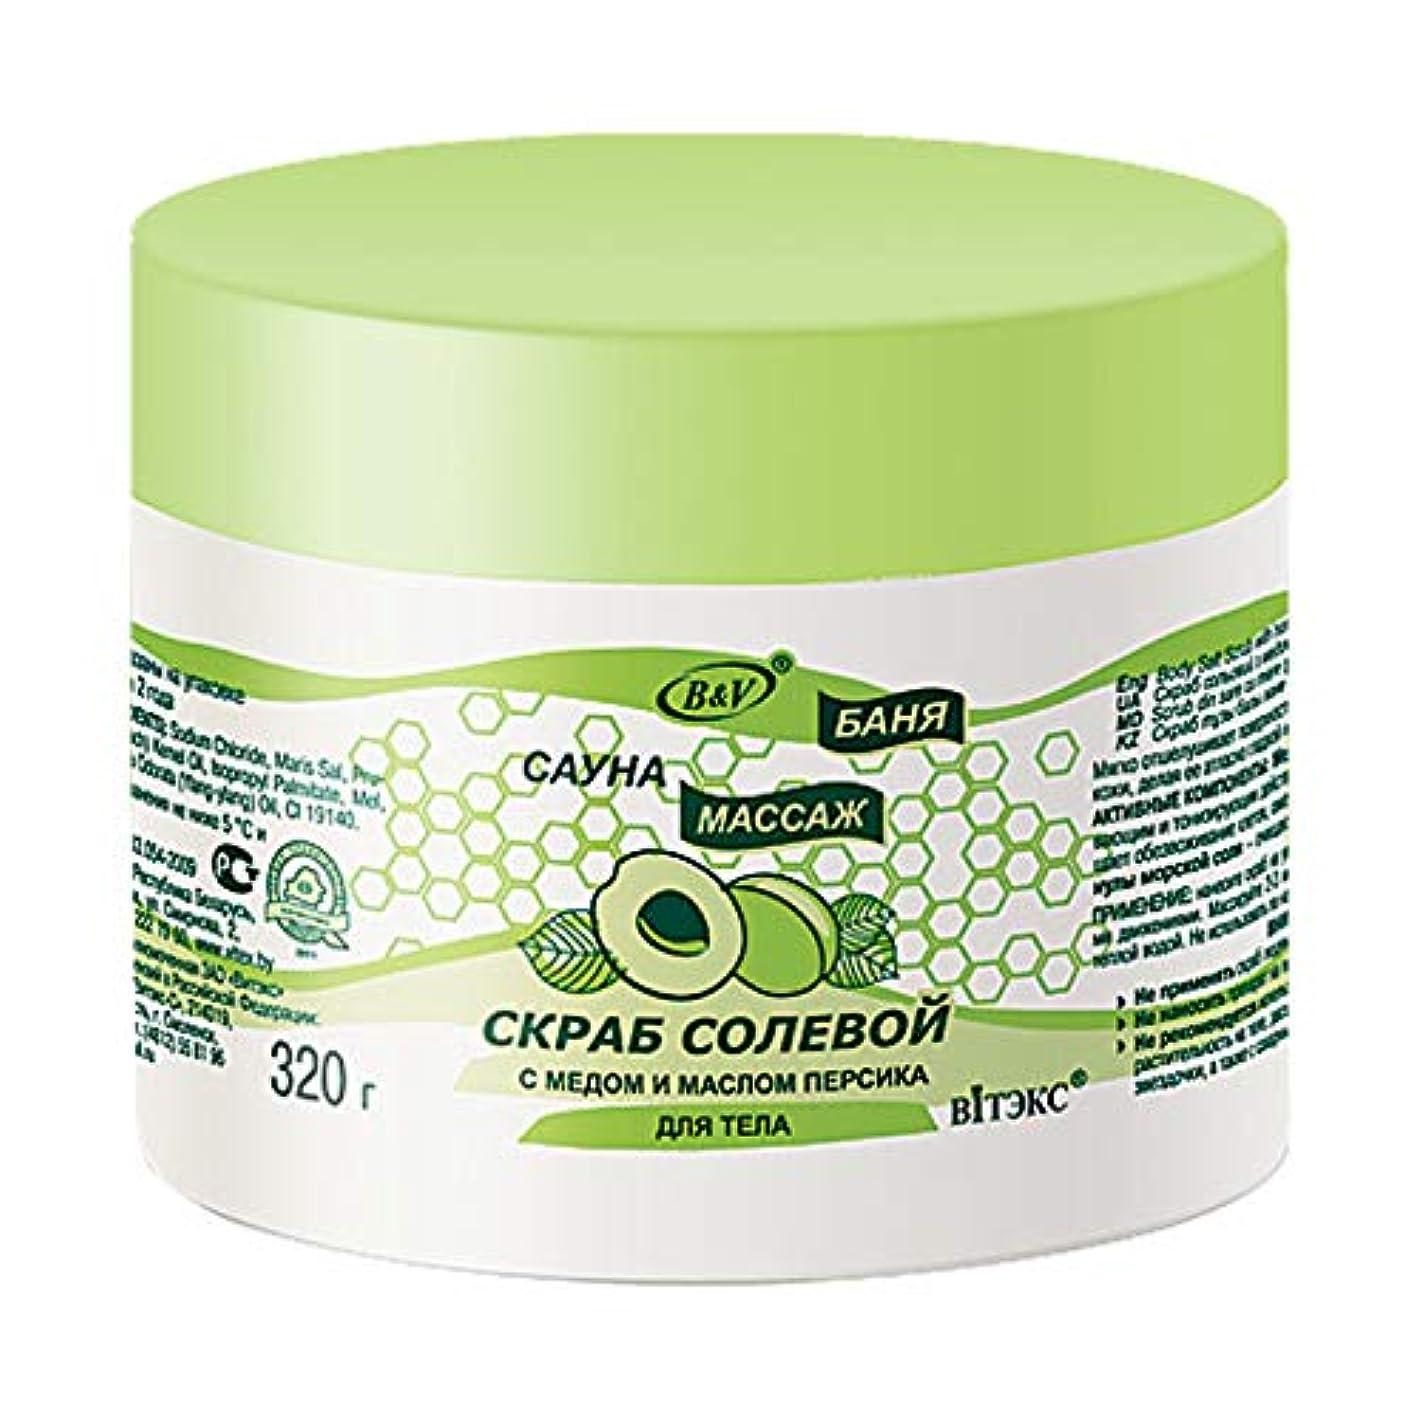 軽食品バックアップBielita & Vitex | Bath Sauna Massage | Body Salt Scrub | Honey | Peach Oil | Sea Oil Granules | Vitamins | 320 ml